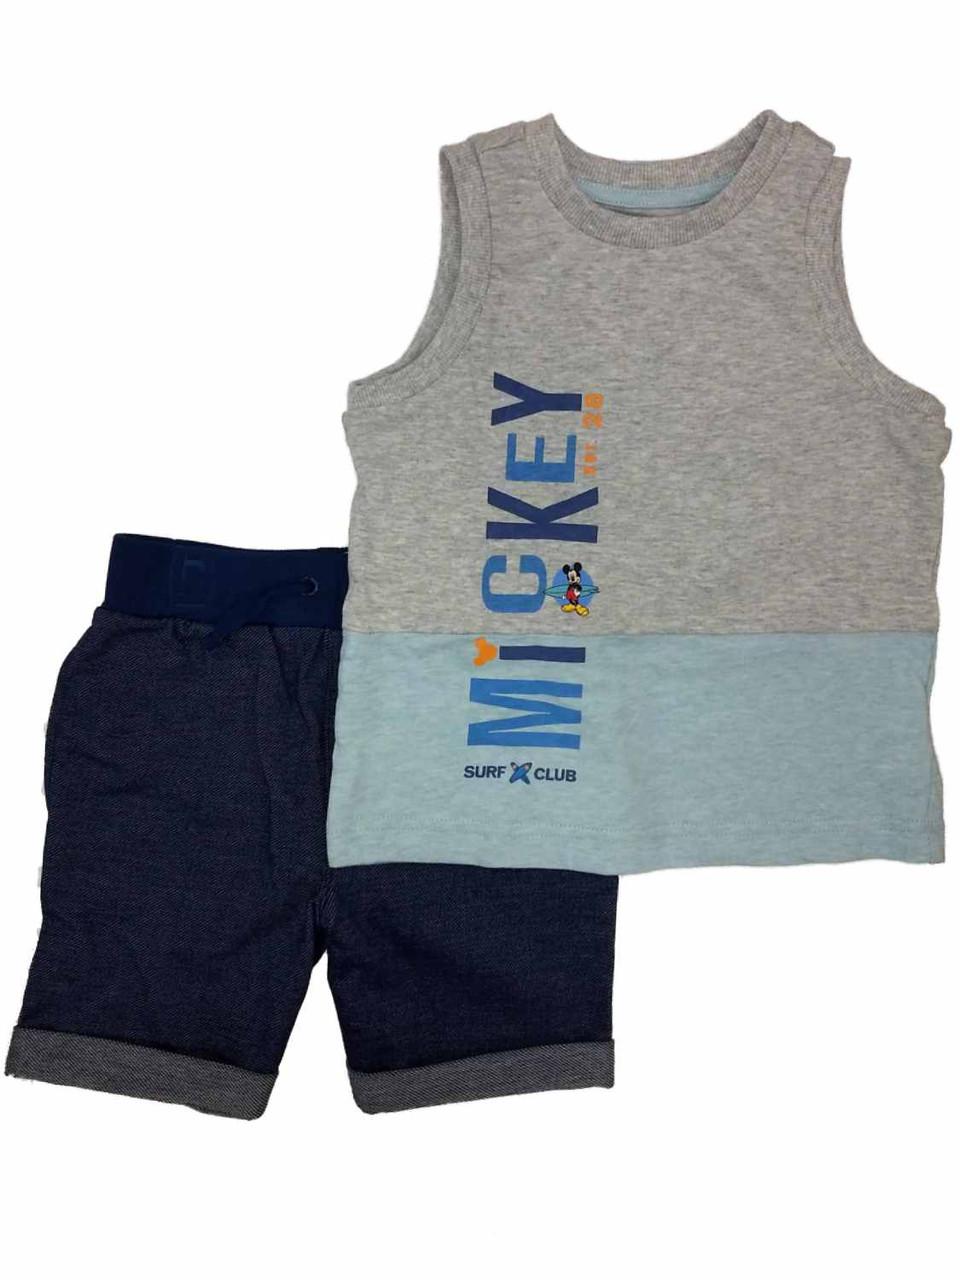 Disney Cars Infant /& Toddler Boys Lightning McQueen Tank Top /& Shorts Set